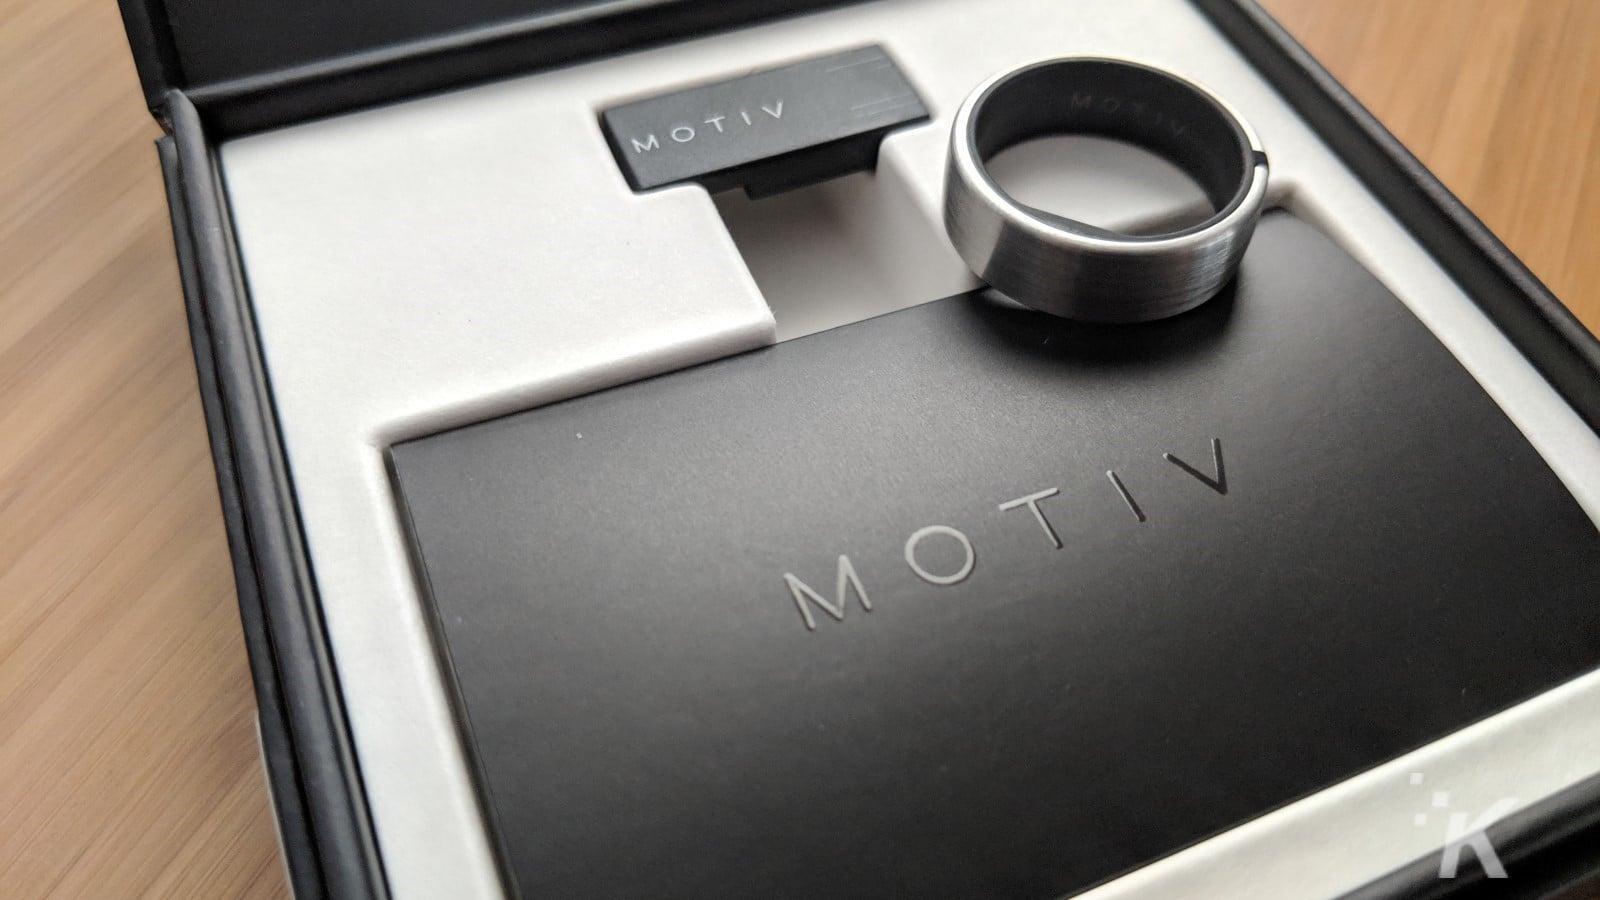 motiv fitness tracking ring on box